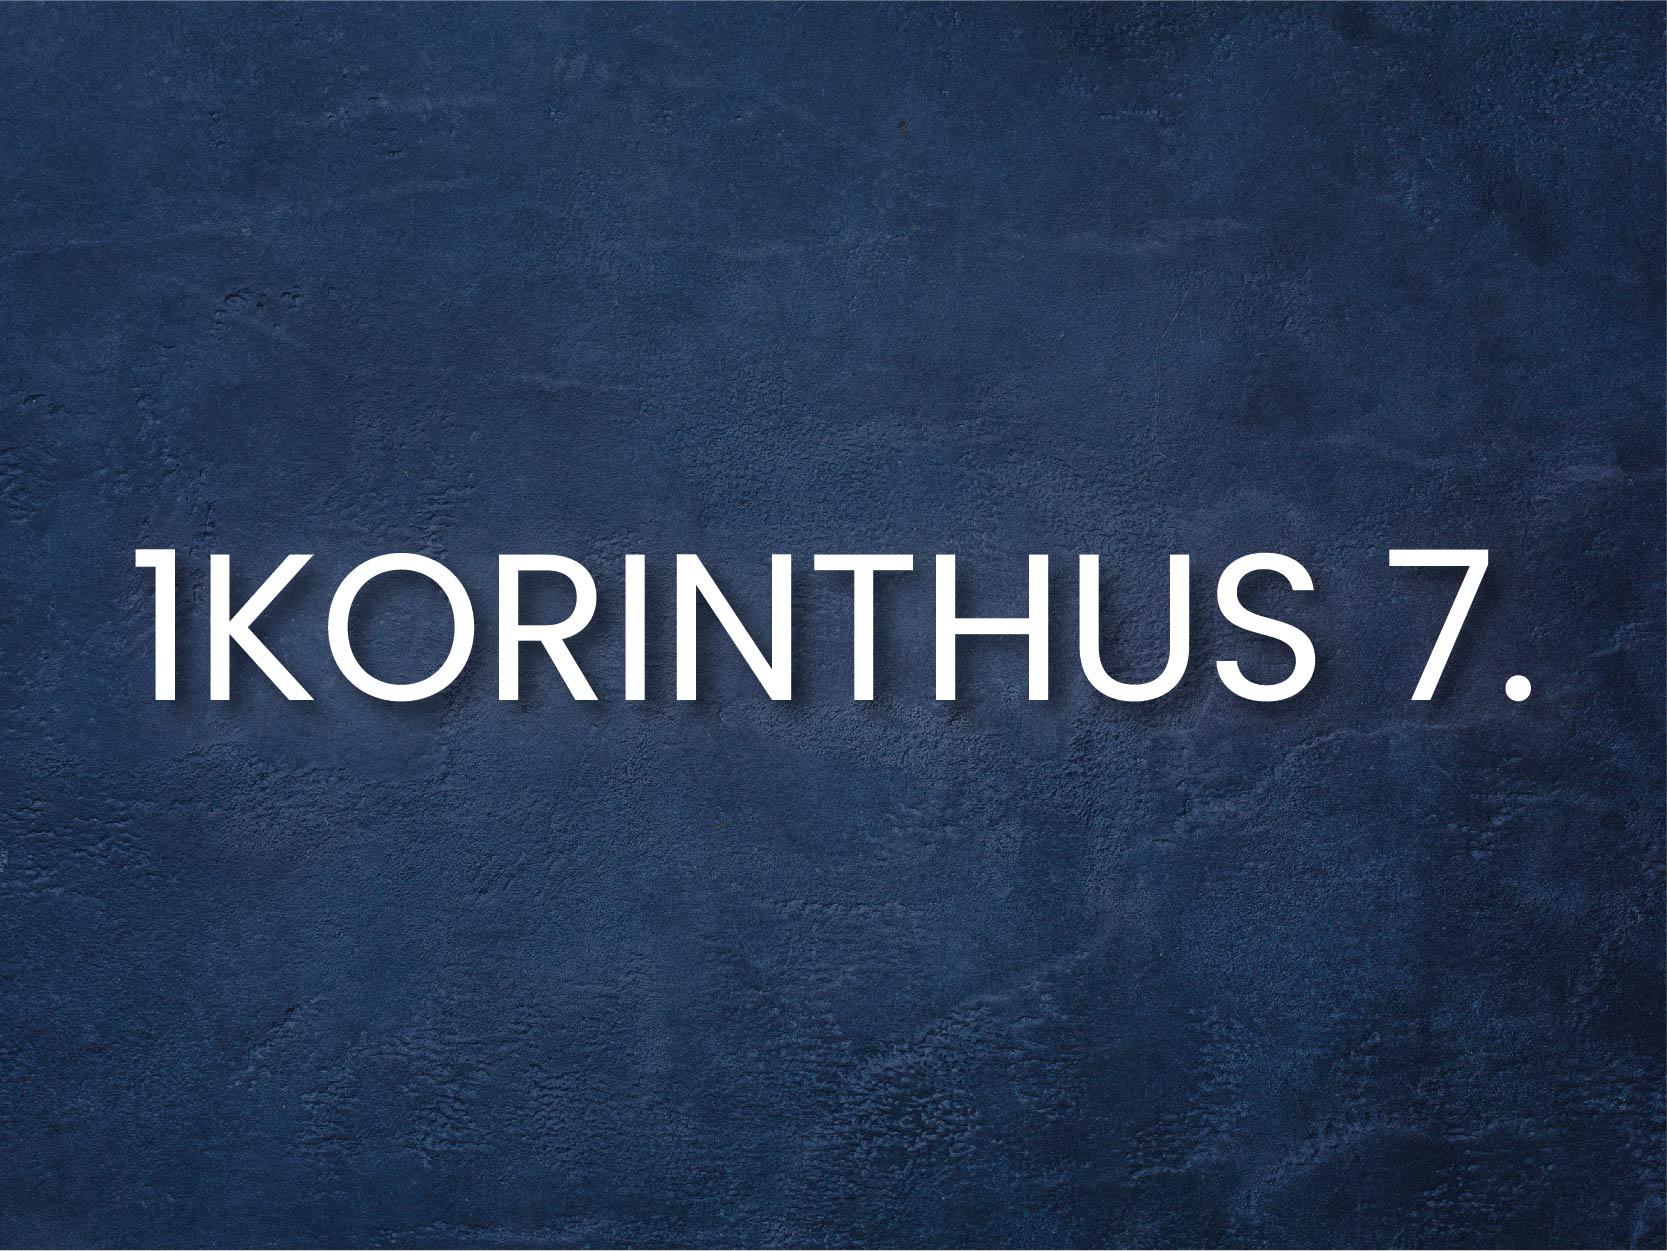 INFO_korinthus_7